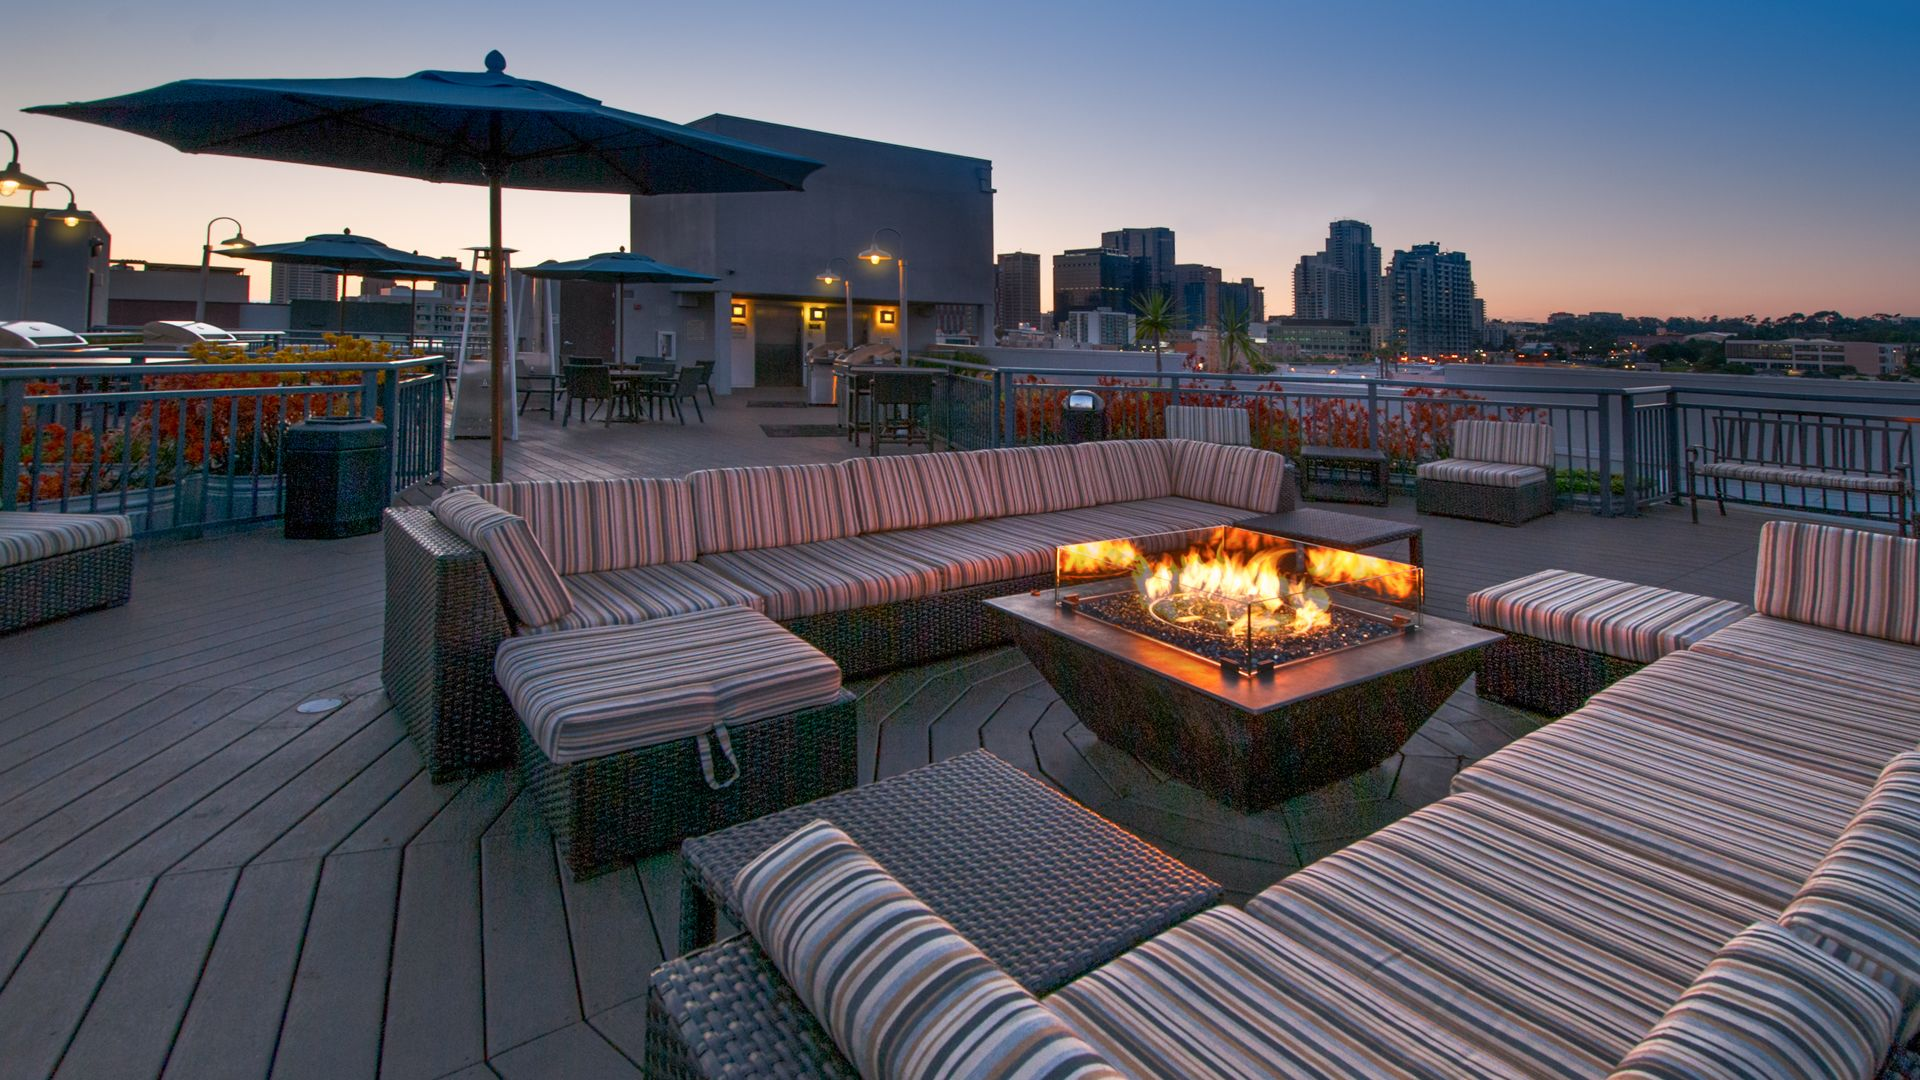 Market Street Village Apartments - Rooftop